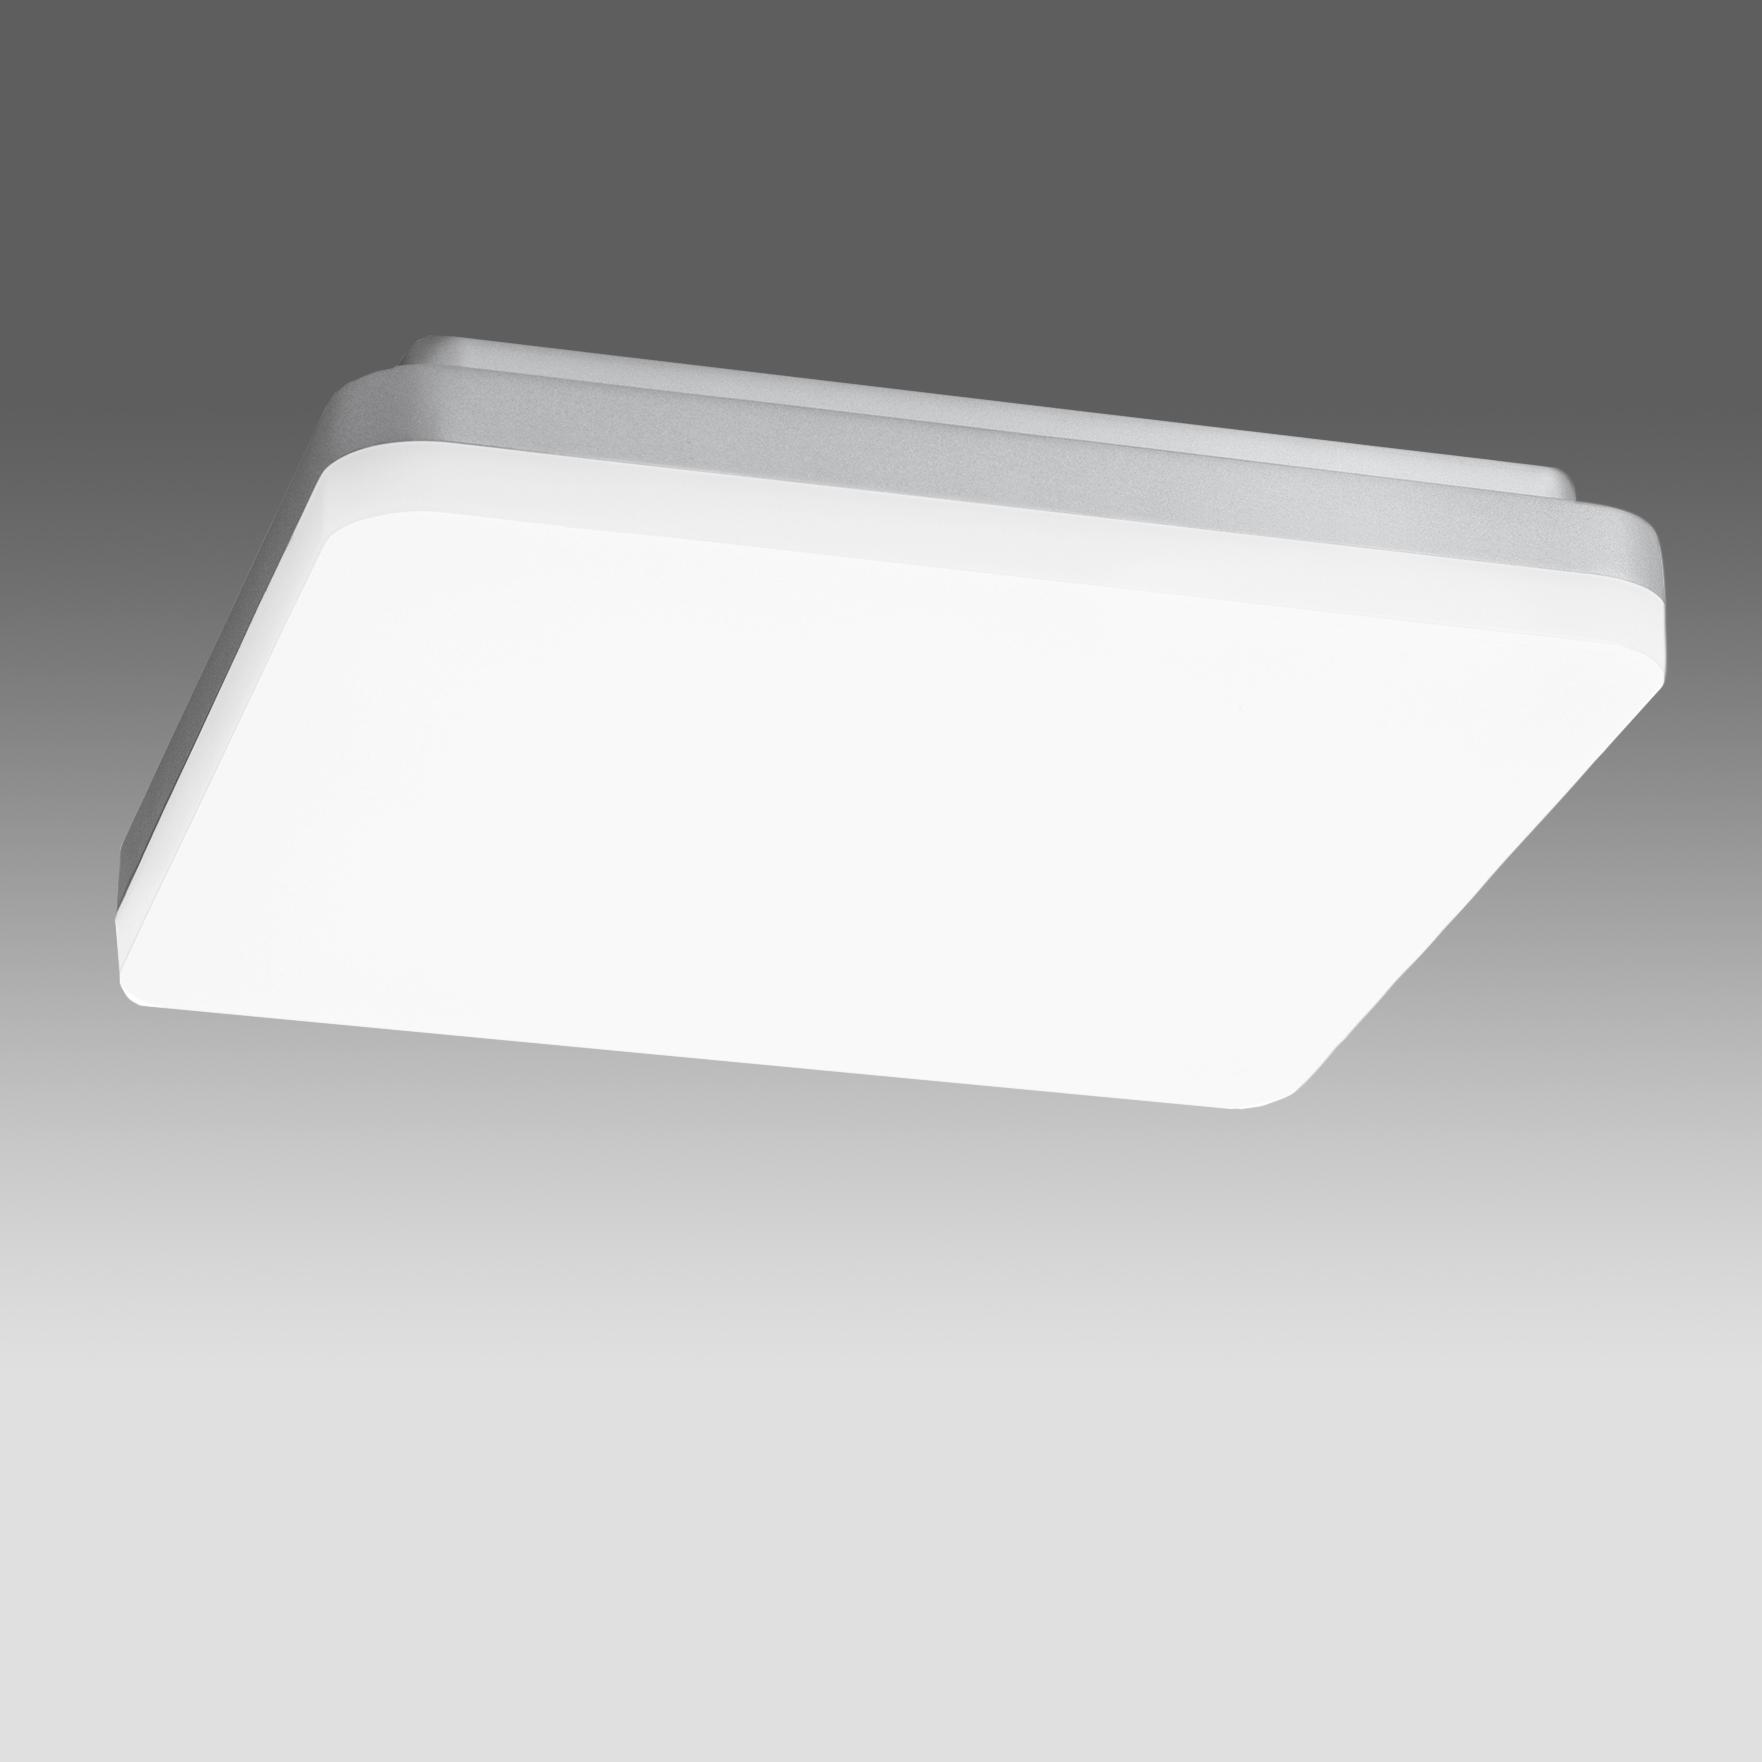 1 Stk Elegance Square III 27W 2800lm 4000K Triac Dim IP20 silber LILE0040--